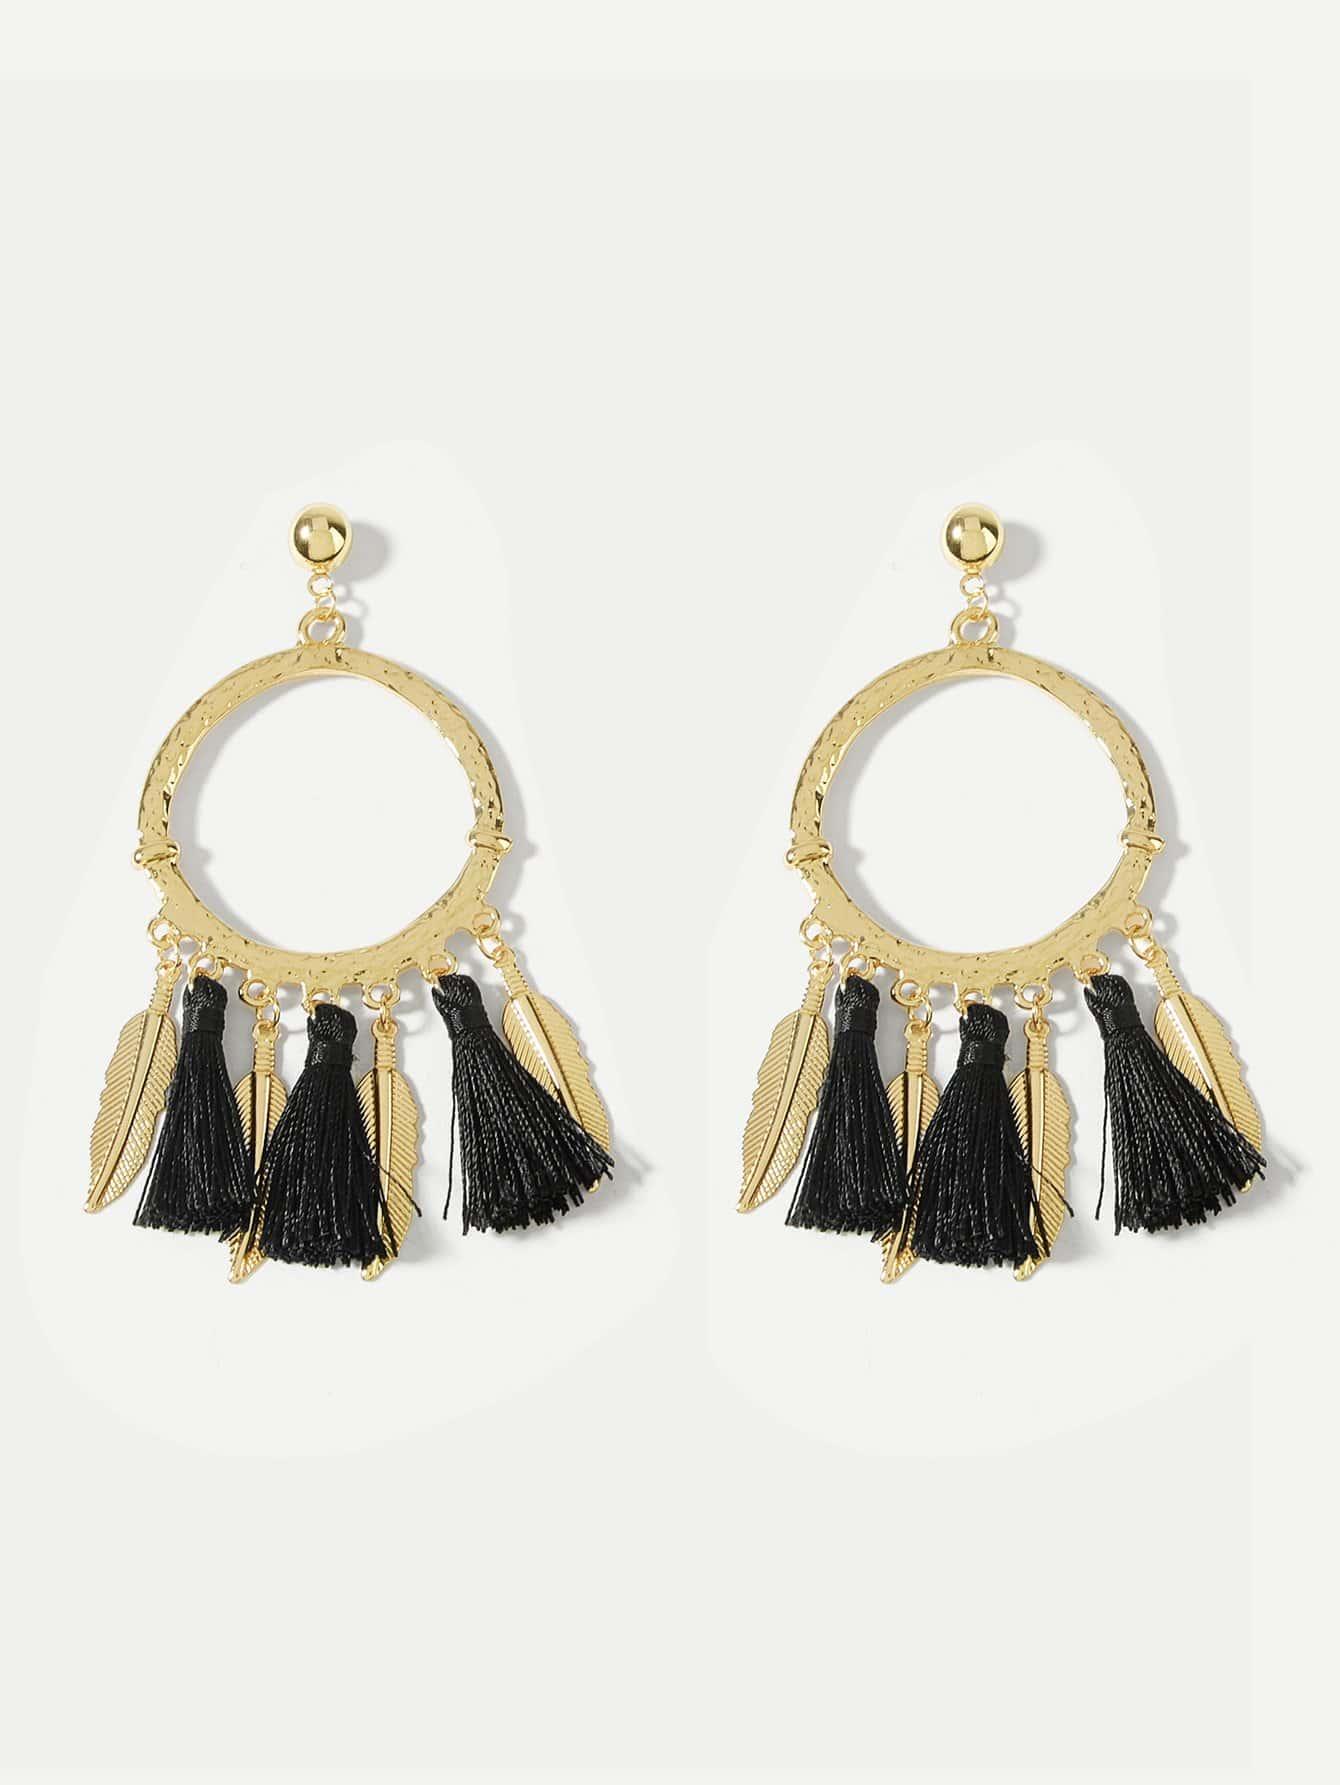 Fringe Tassel Hoop Drop Earrings